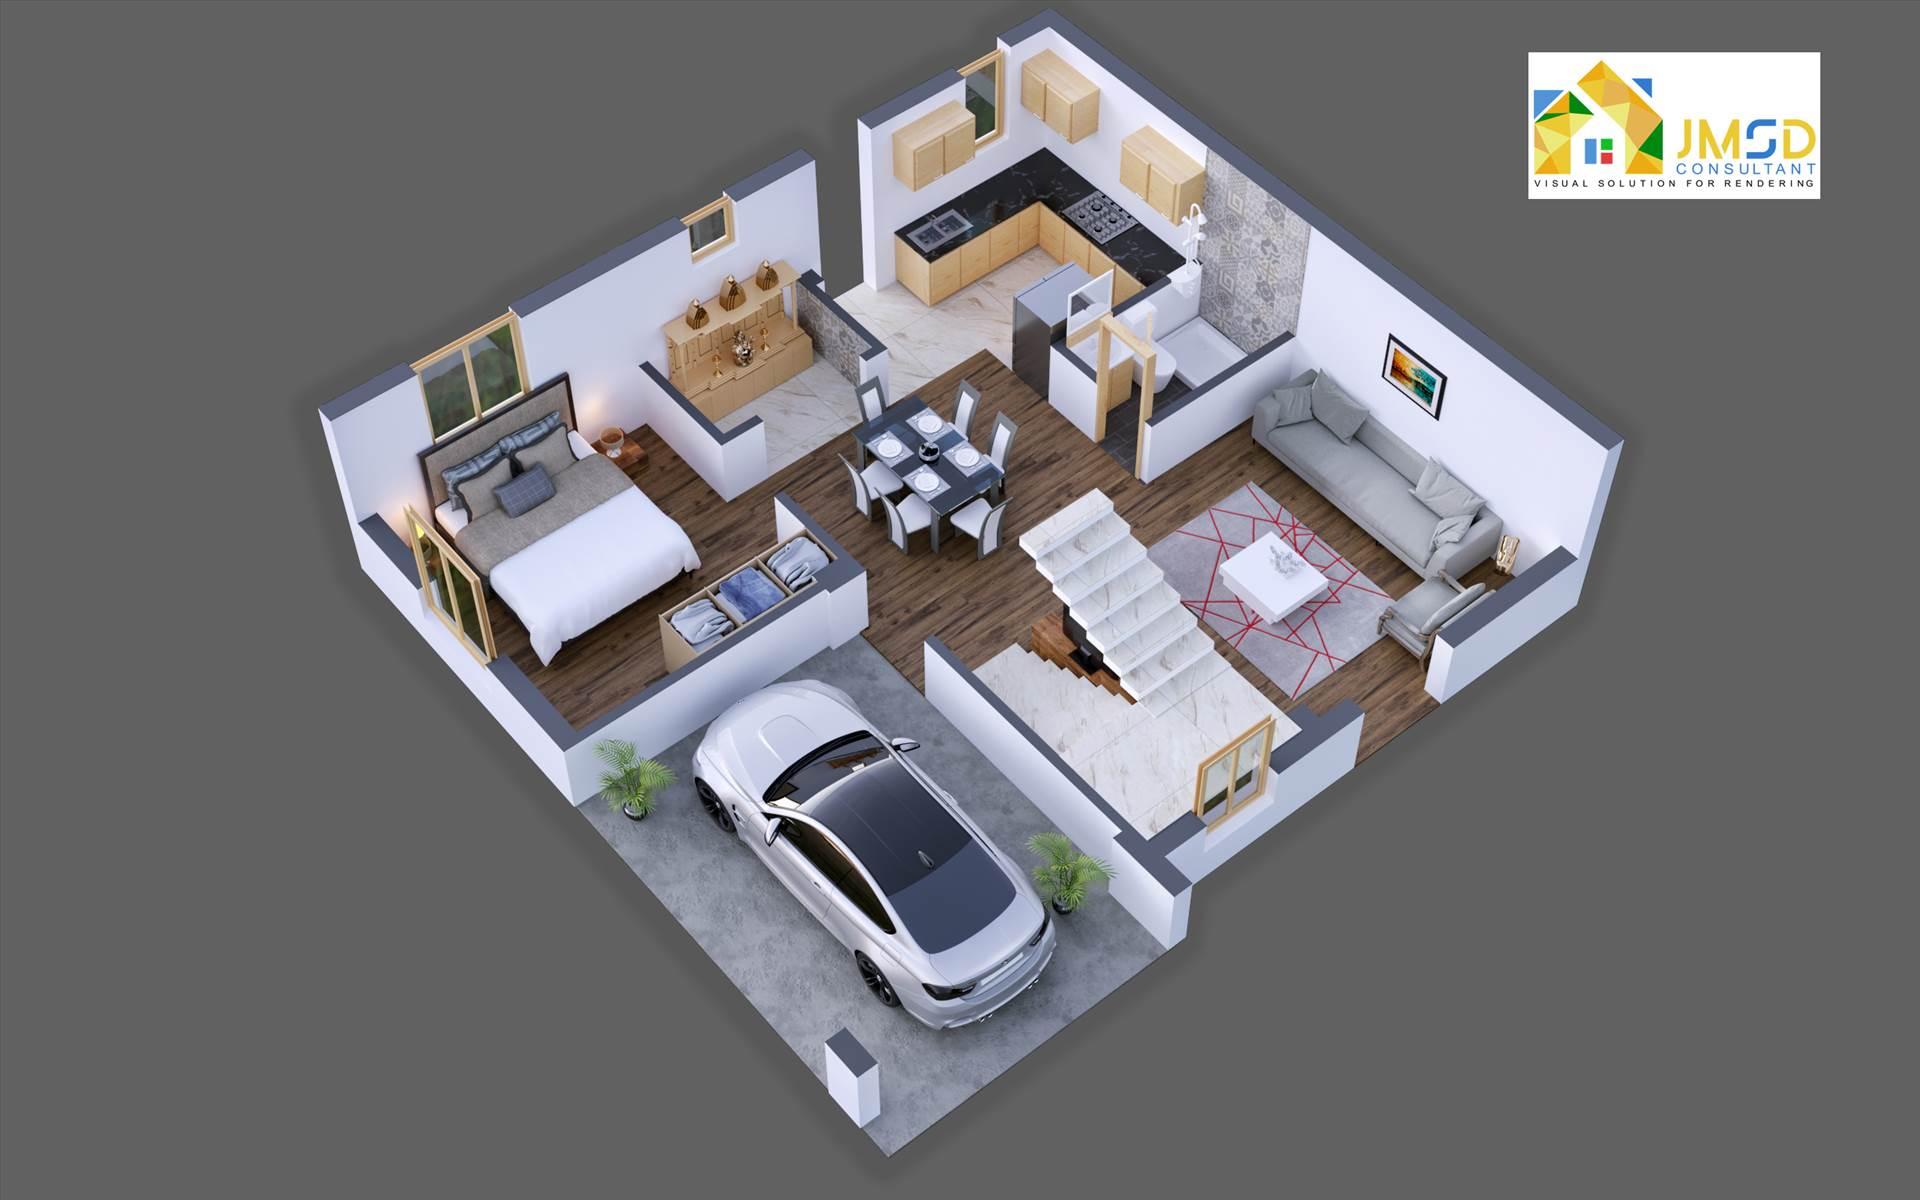 3D Floor Plan Visualization Services 3D ARCHITECTURAL FLOOR PLAN VISUALIZATION SERVICES FOR PROPERTY RENTALS. by JMSDCONSULTANT